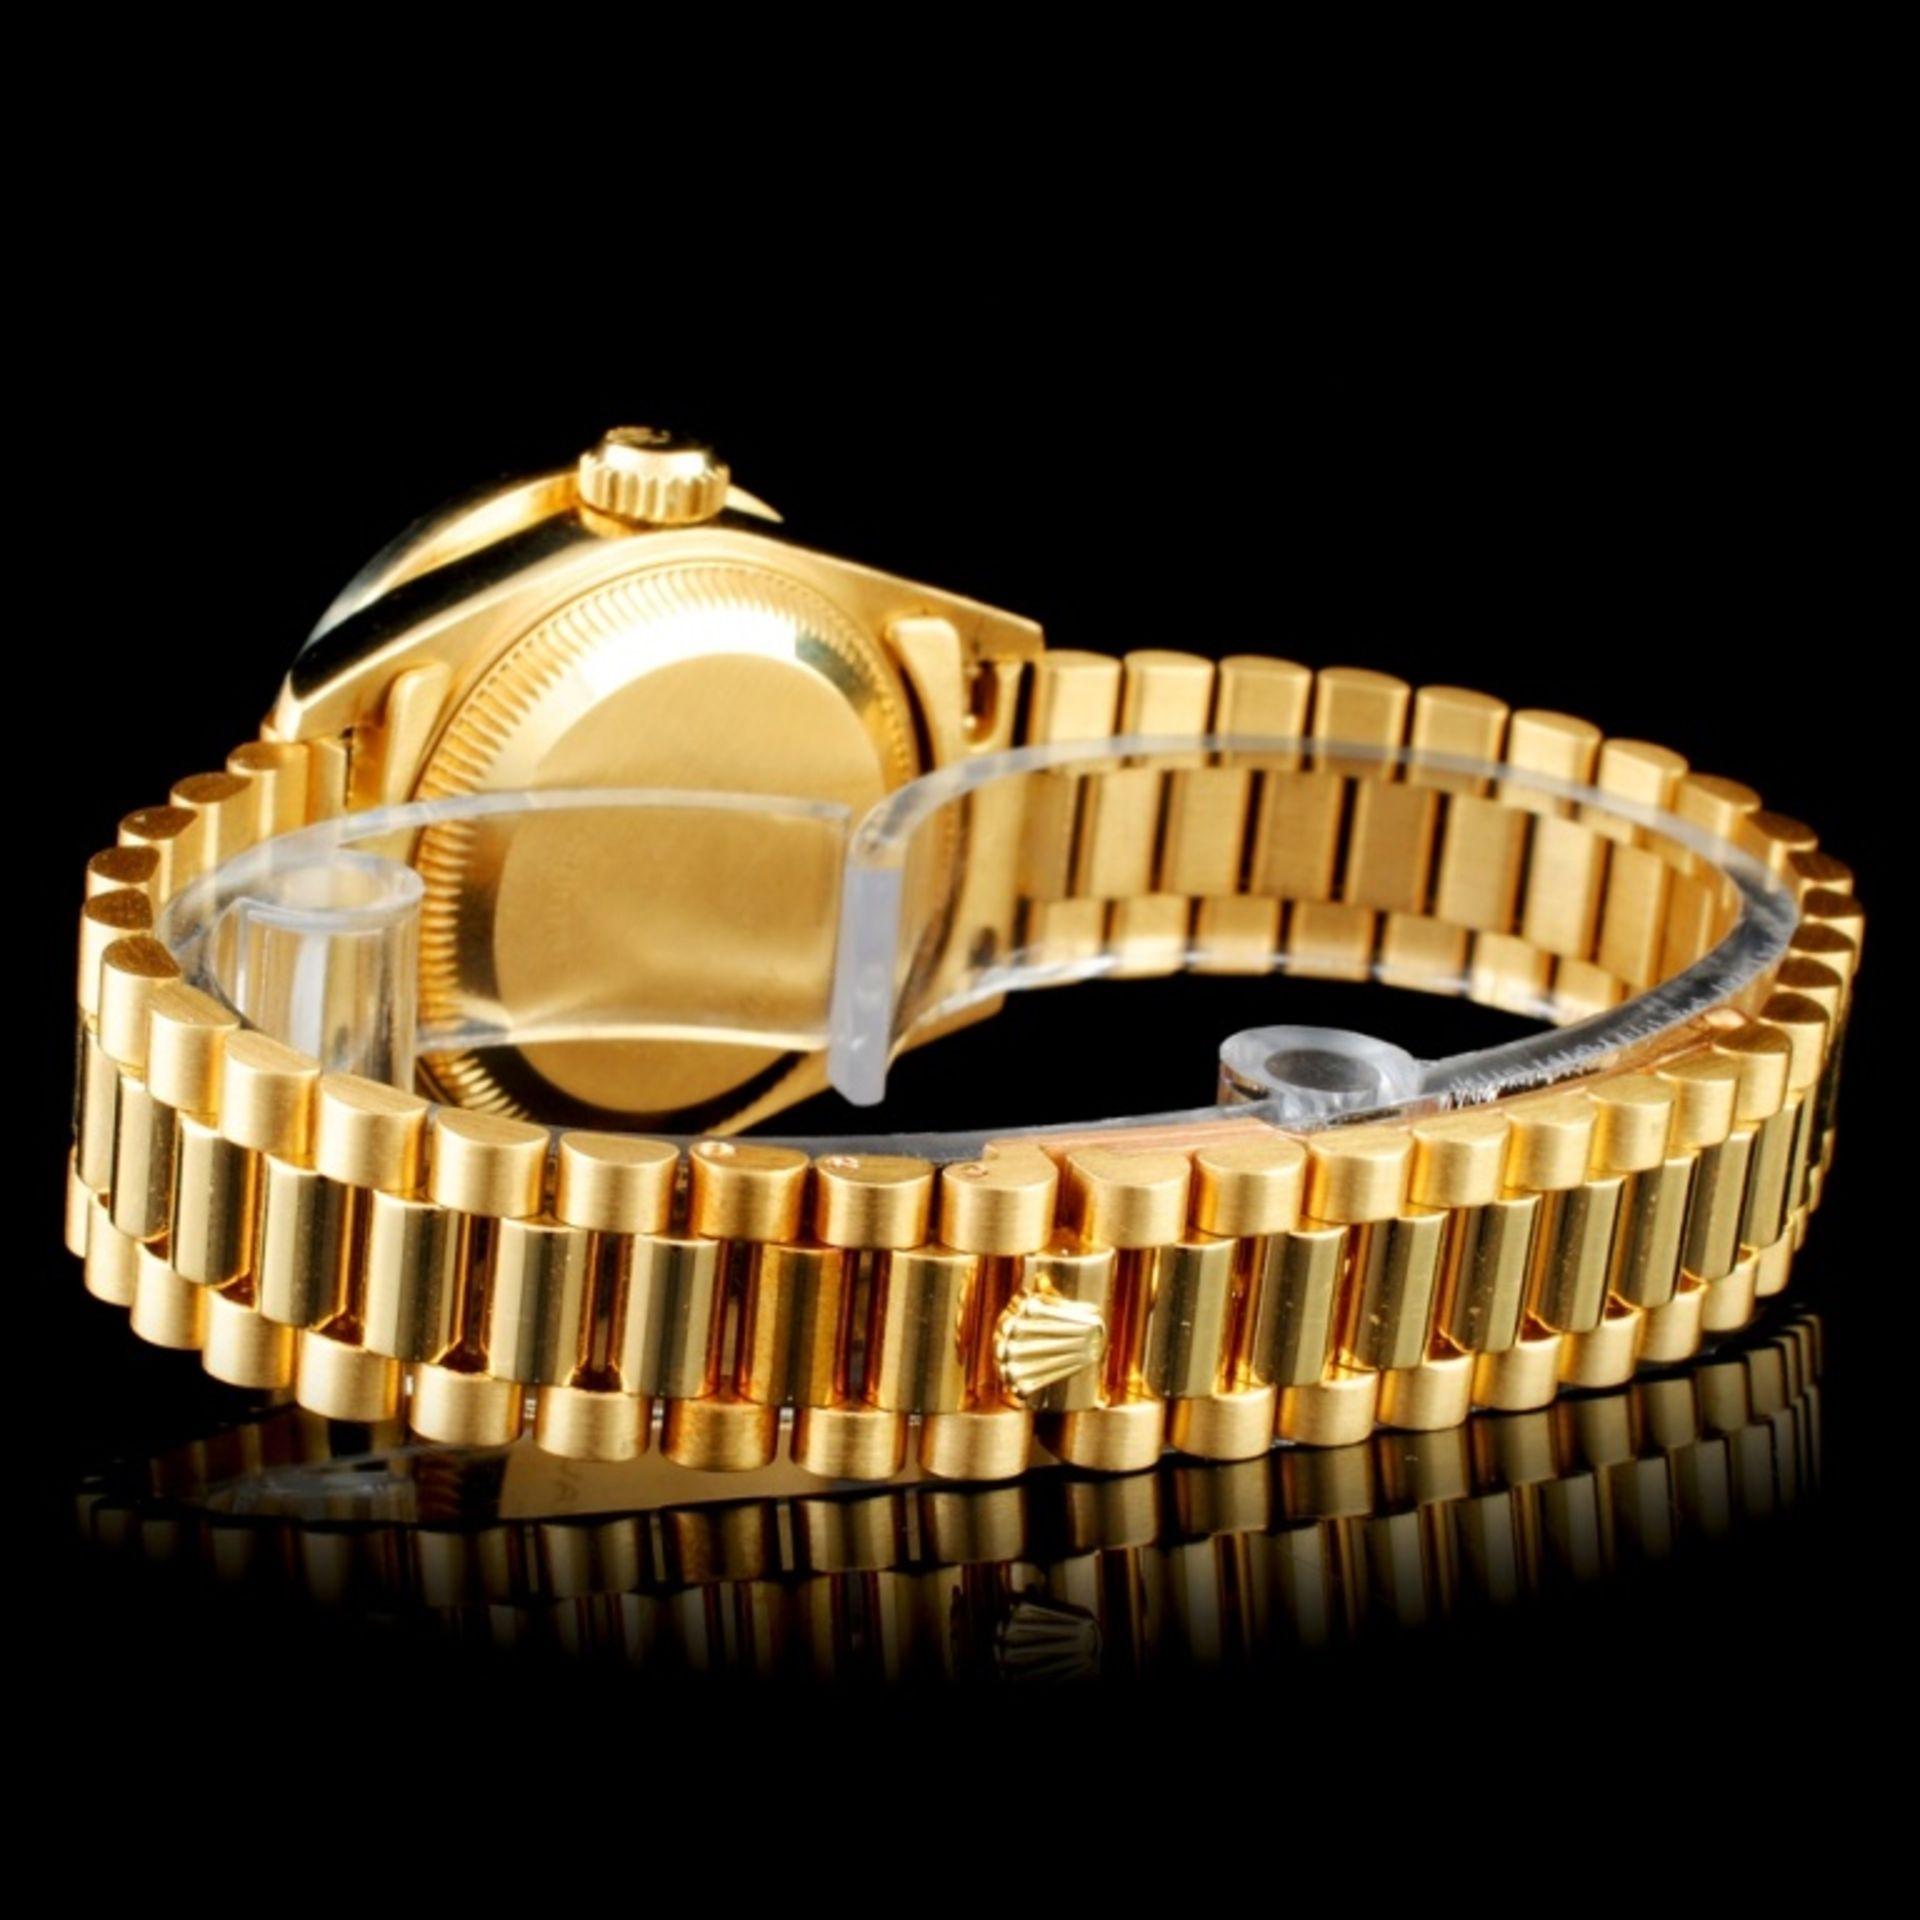 Rolex Presidential Diamond Ladies Watch - Image 4 of 6